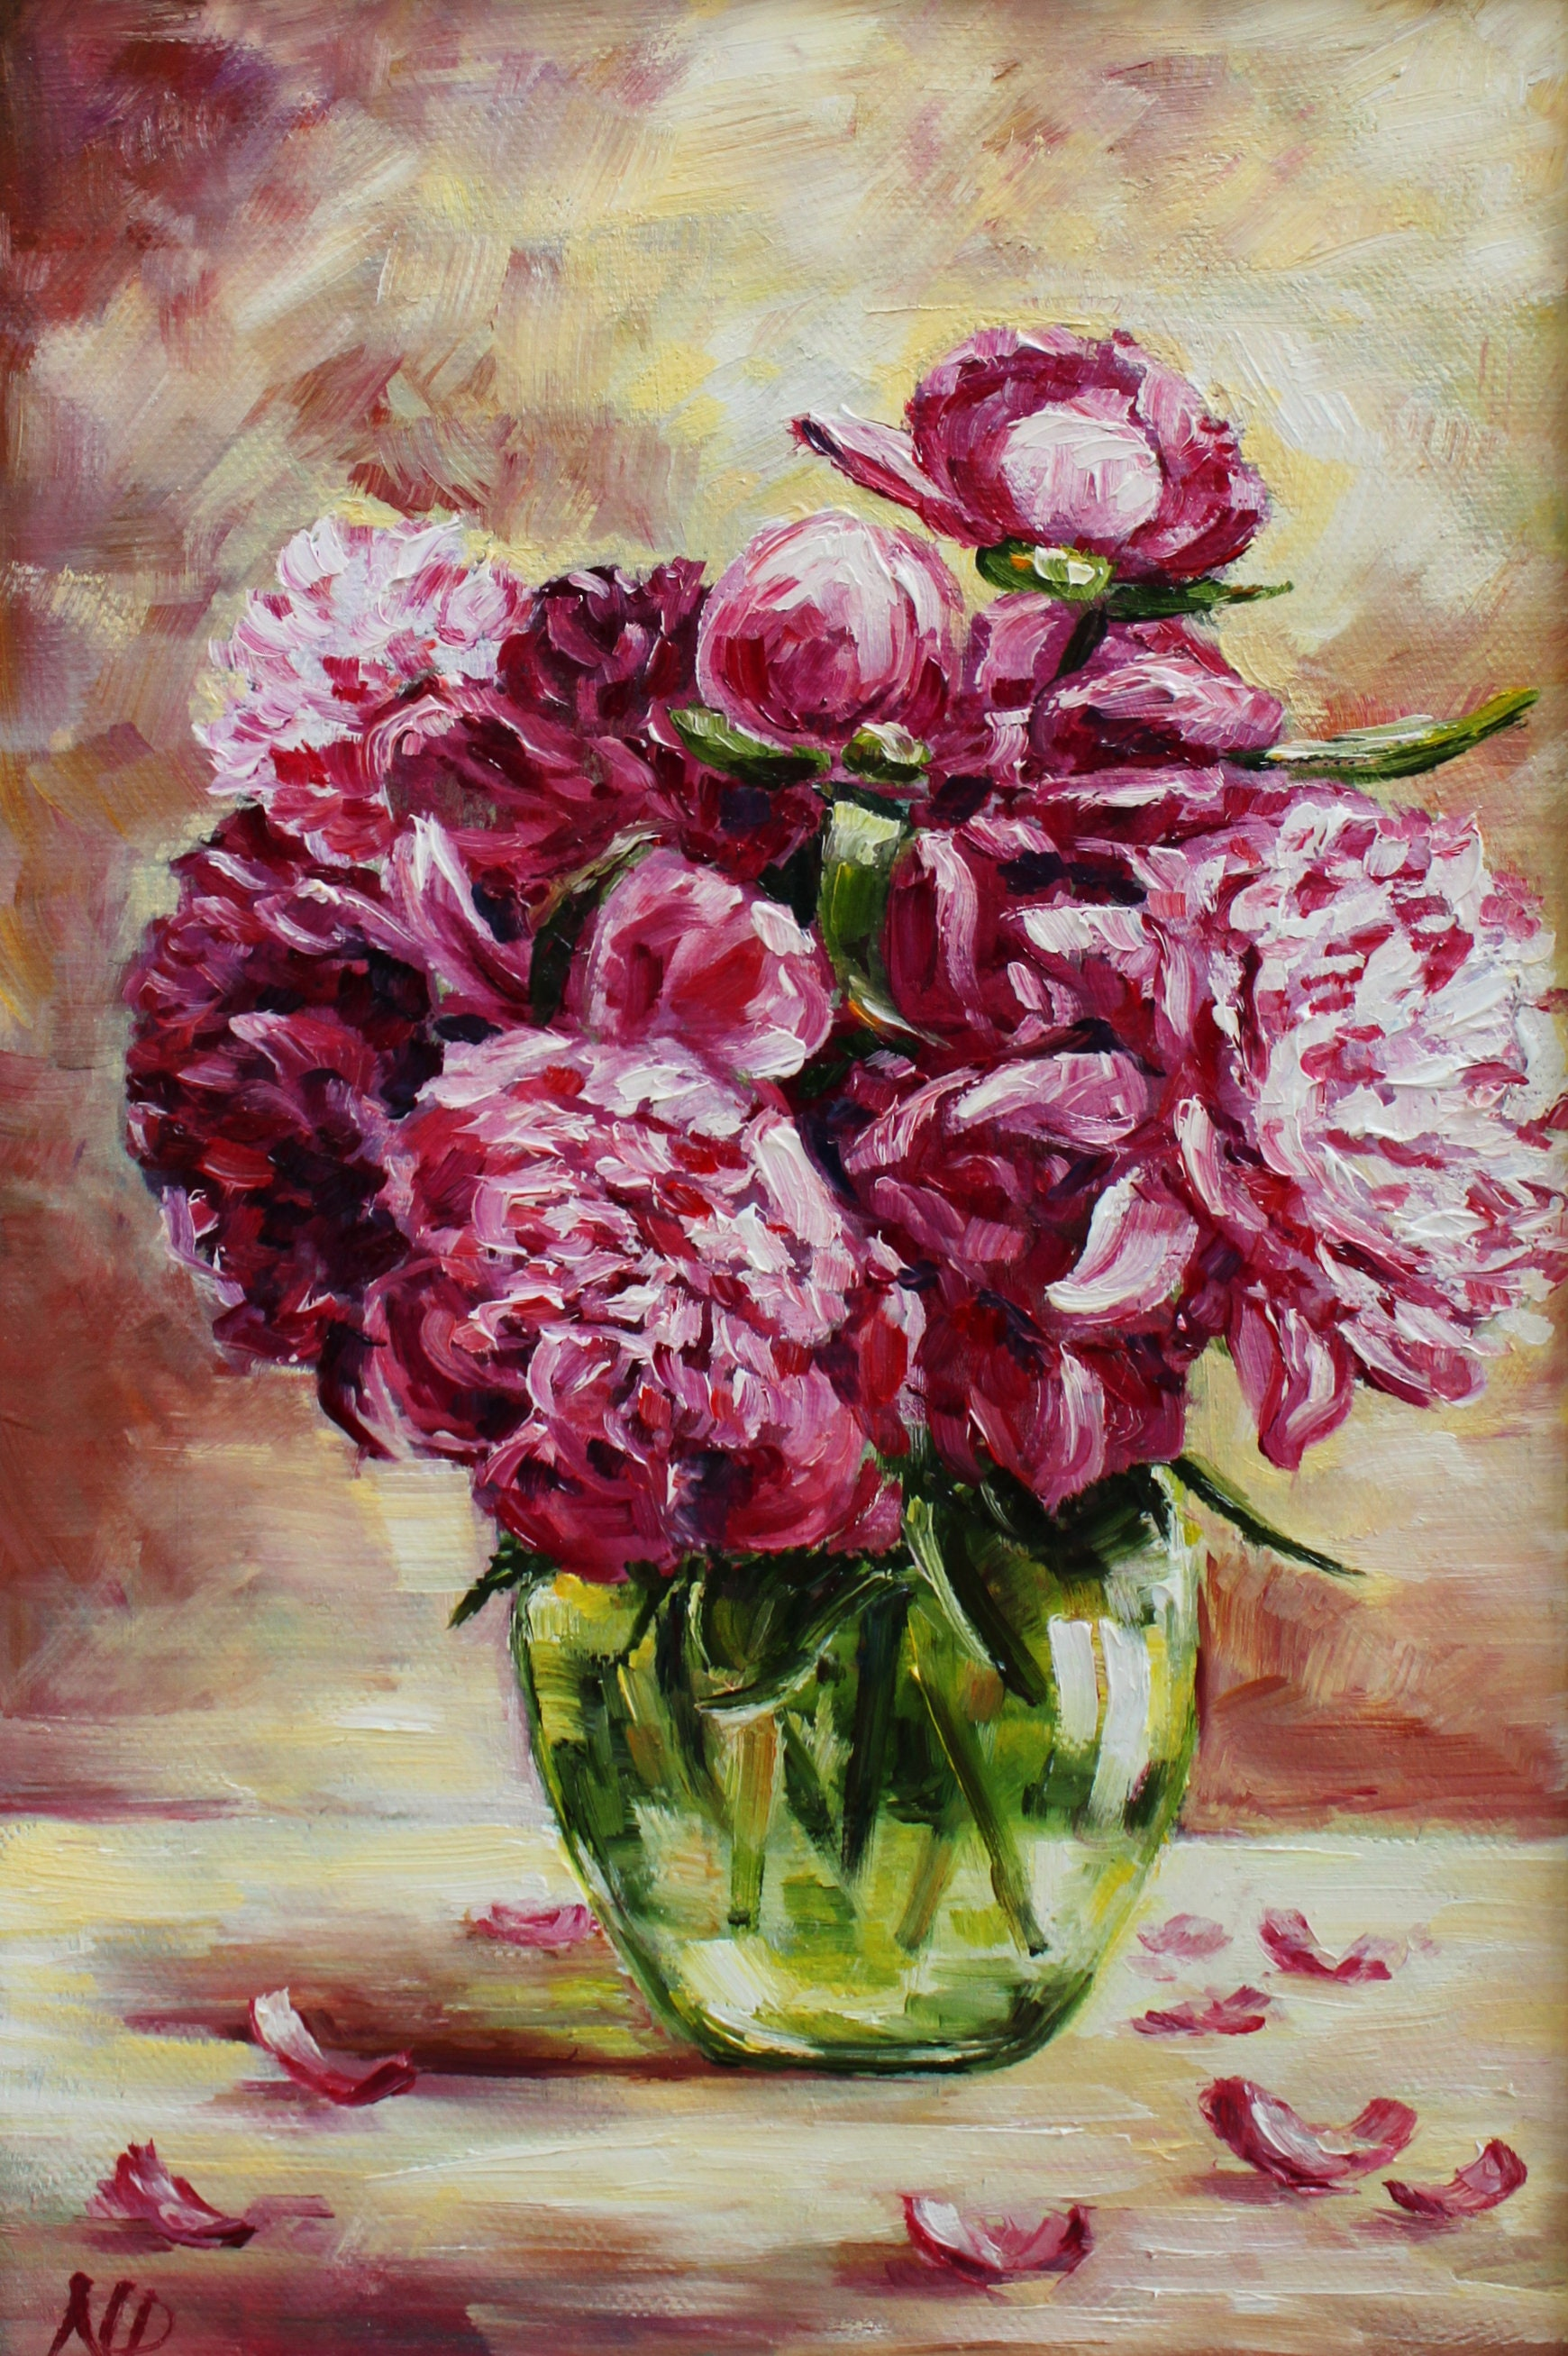 Pfingstrosen Malerei Blume Stillleben gerahmt Gemälde | Etsy